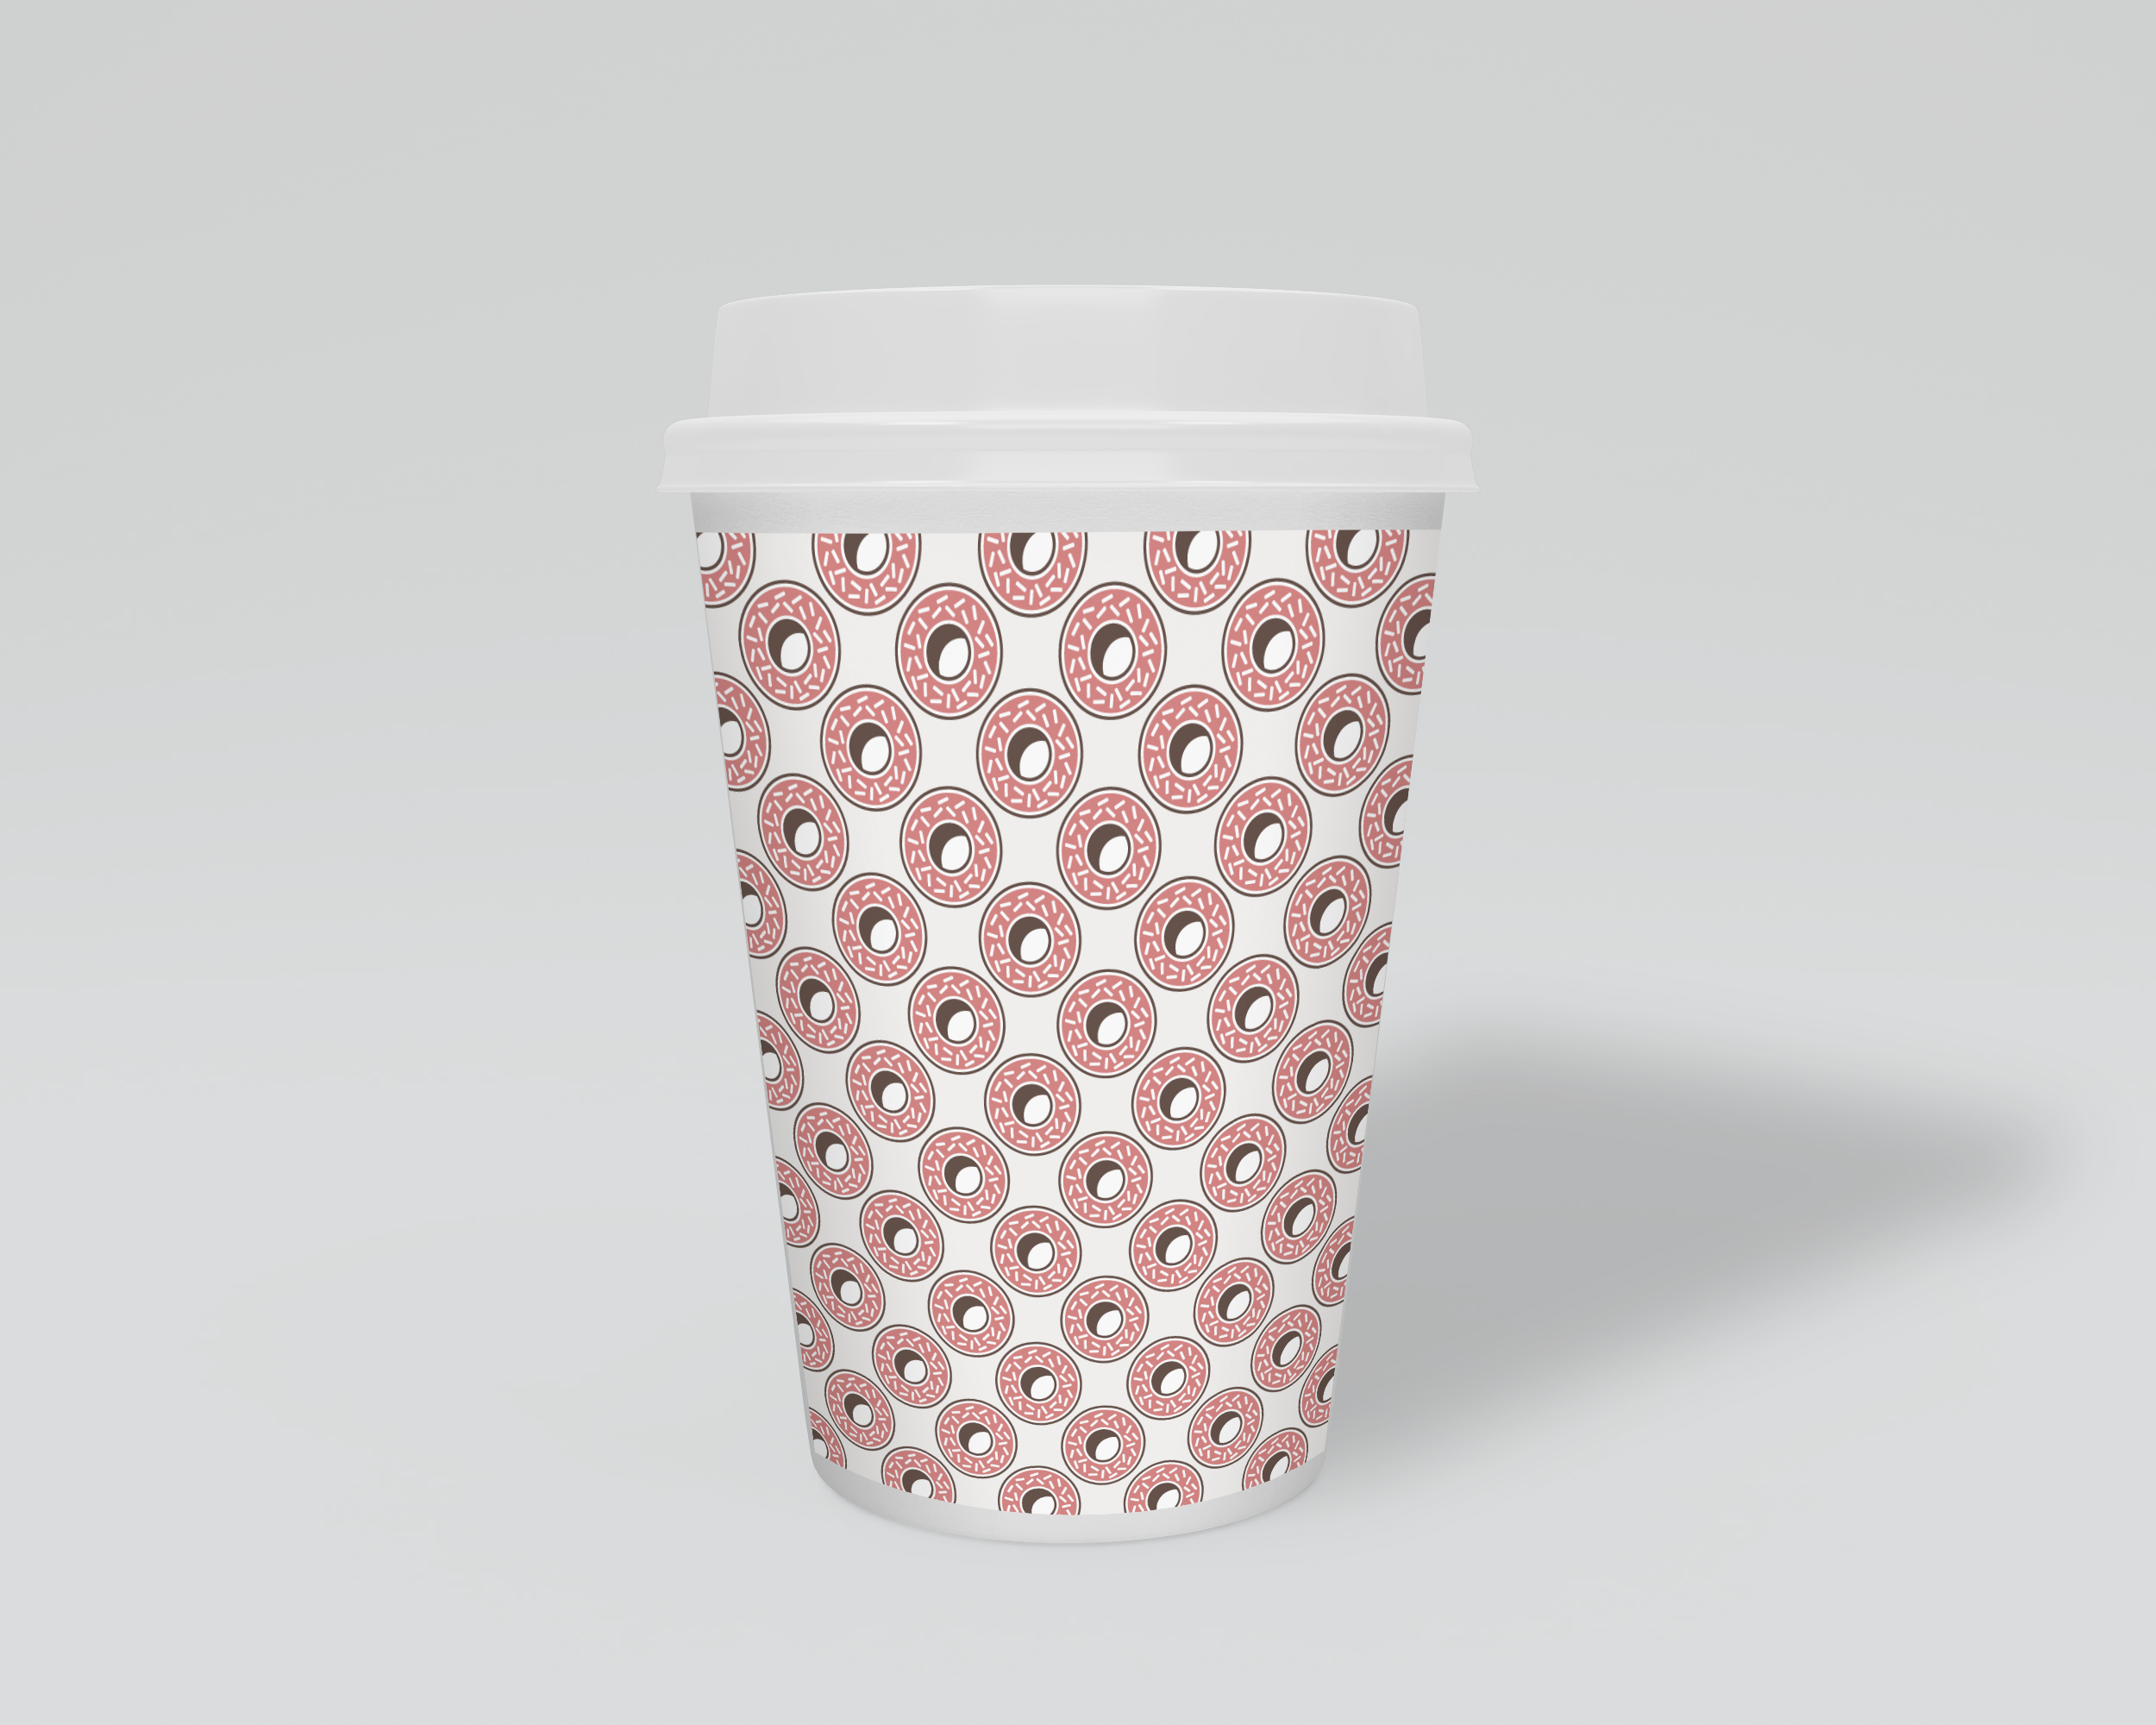 coffeecup3D.jpg